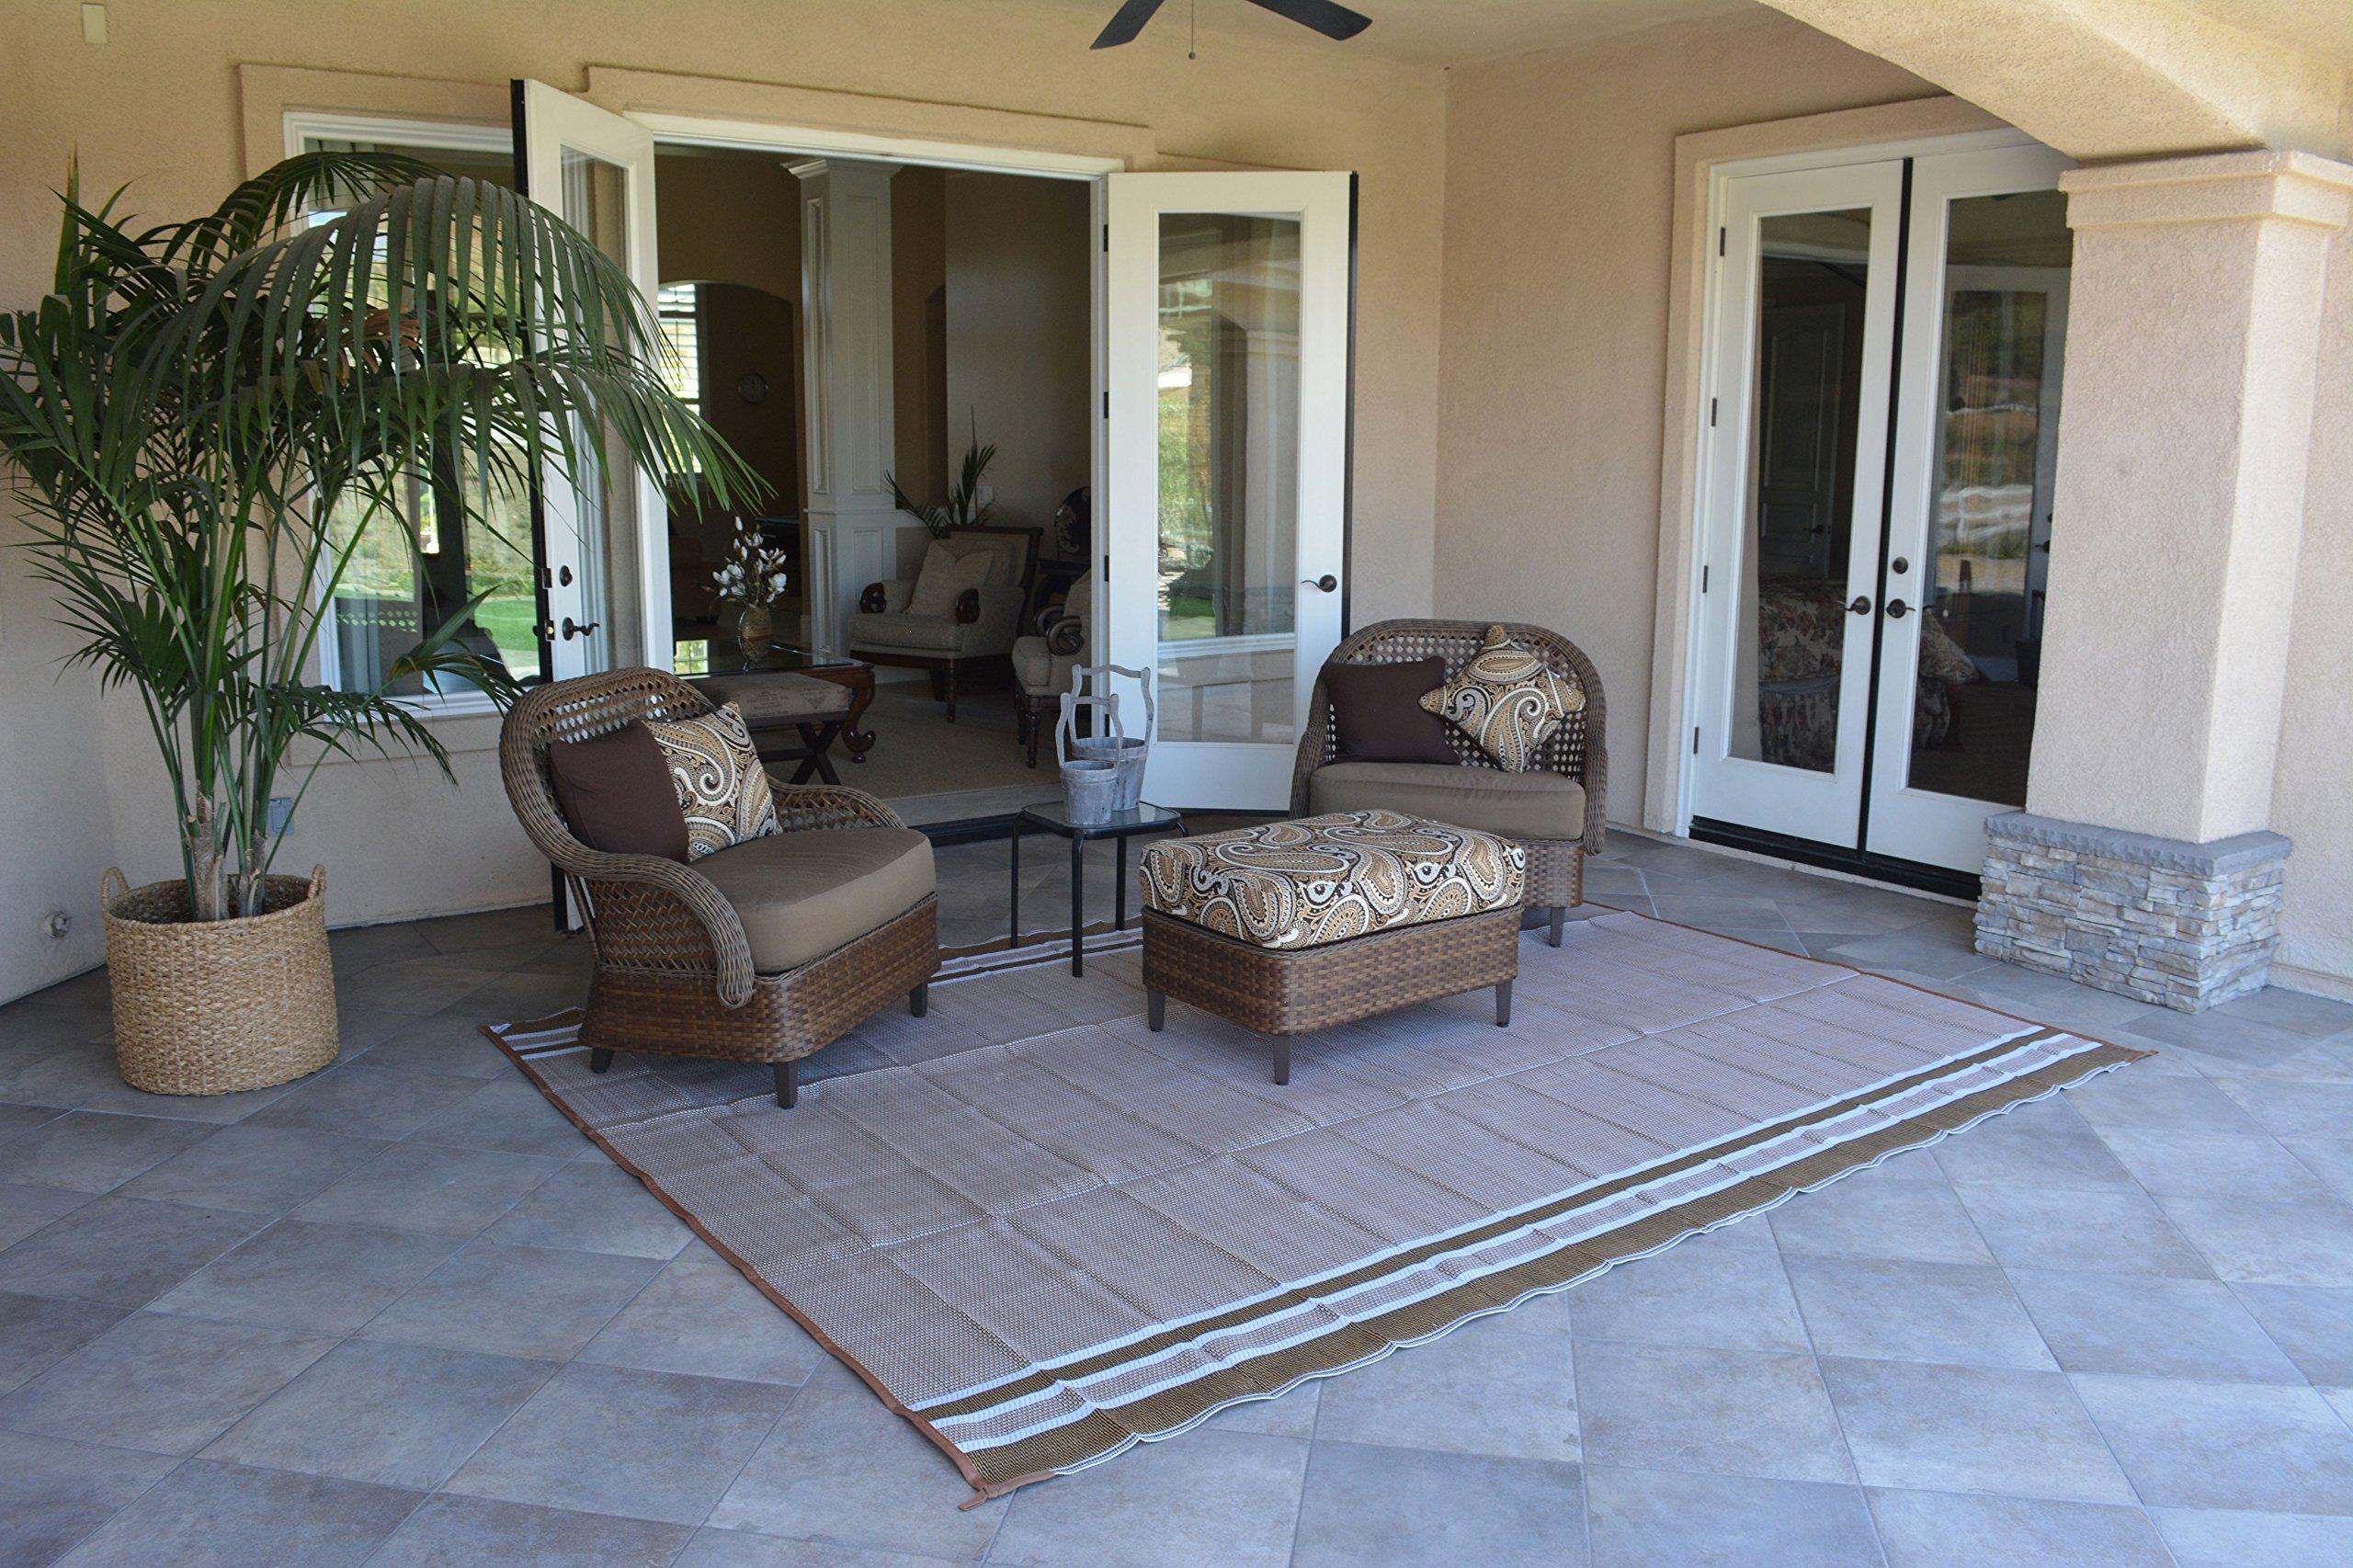 Patio Furniture Rug Beige/White Stripe Backyard Patio Mat Outdoor Reversible Rug (9' x 12')